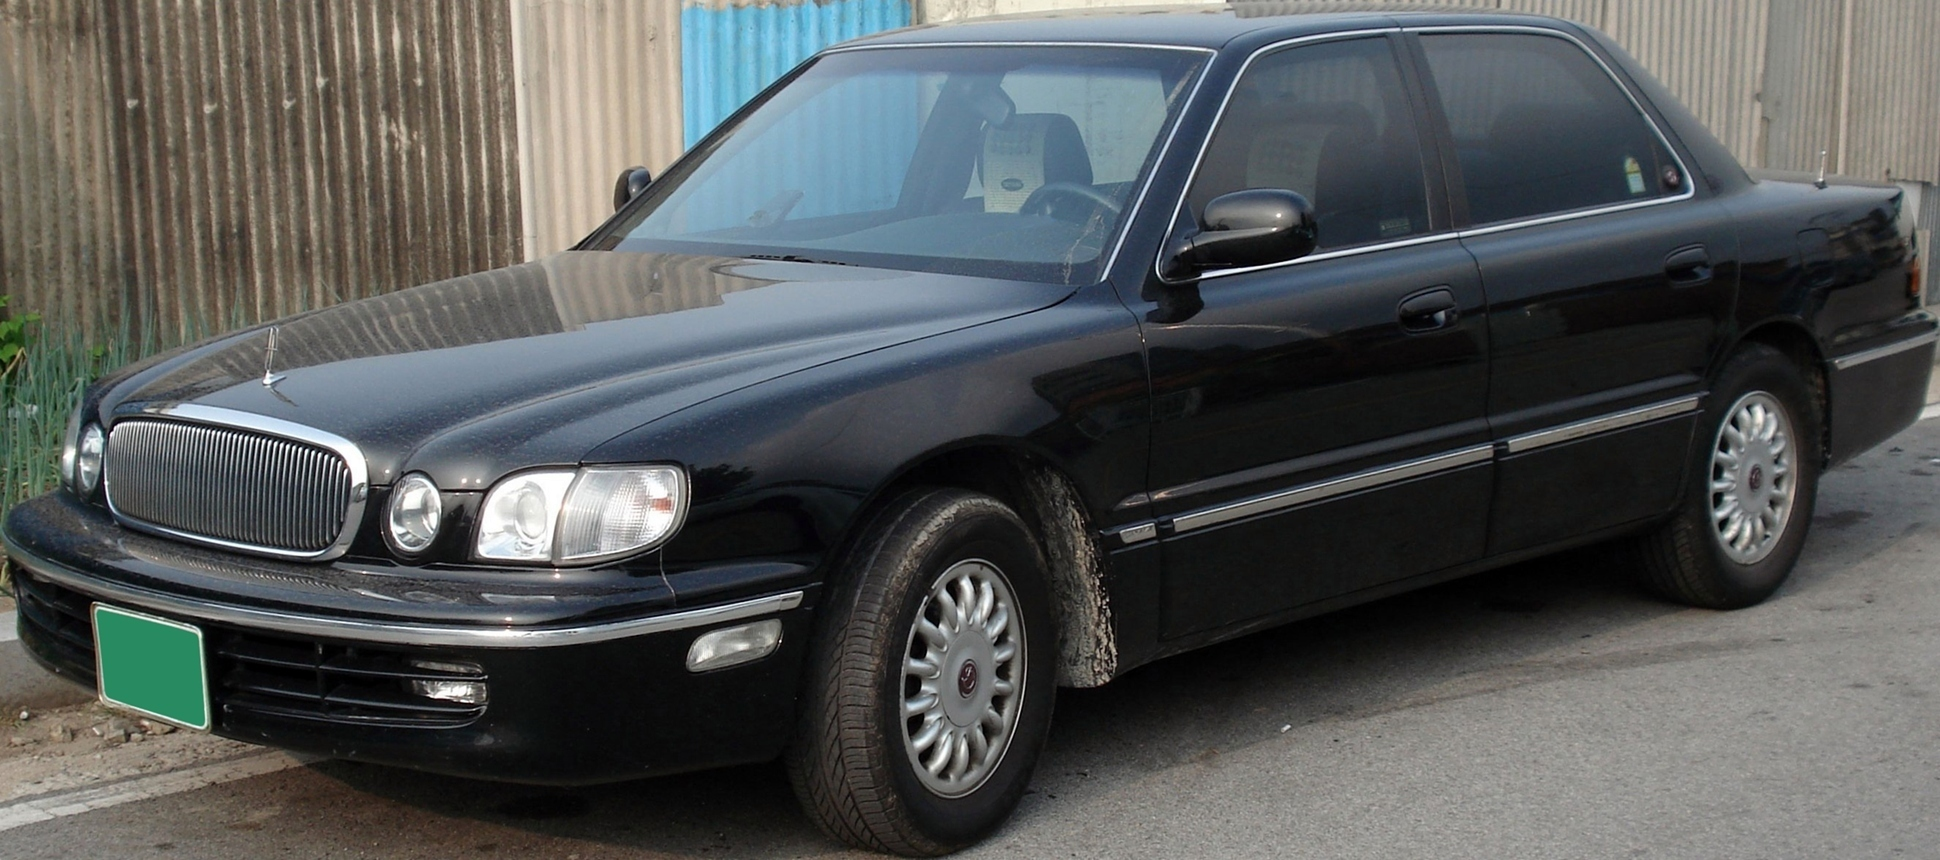 Hyundai Dynasty 1996 - 2005 Sedan #6